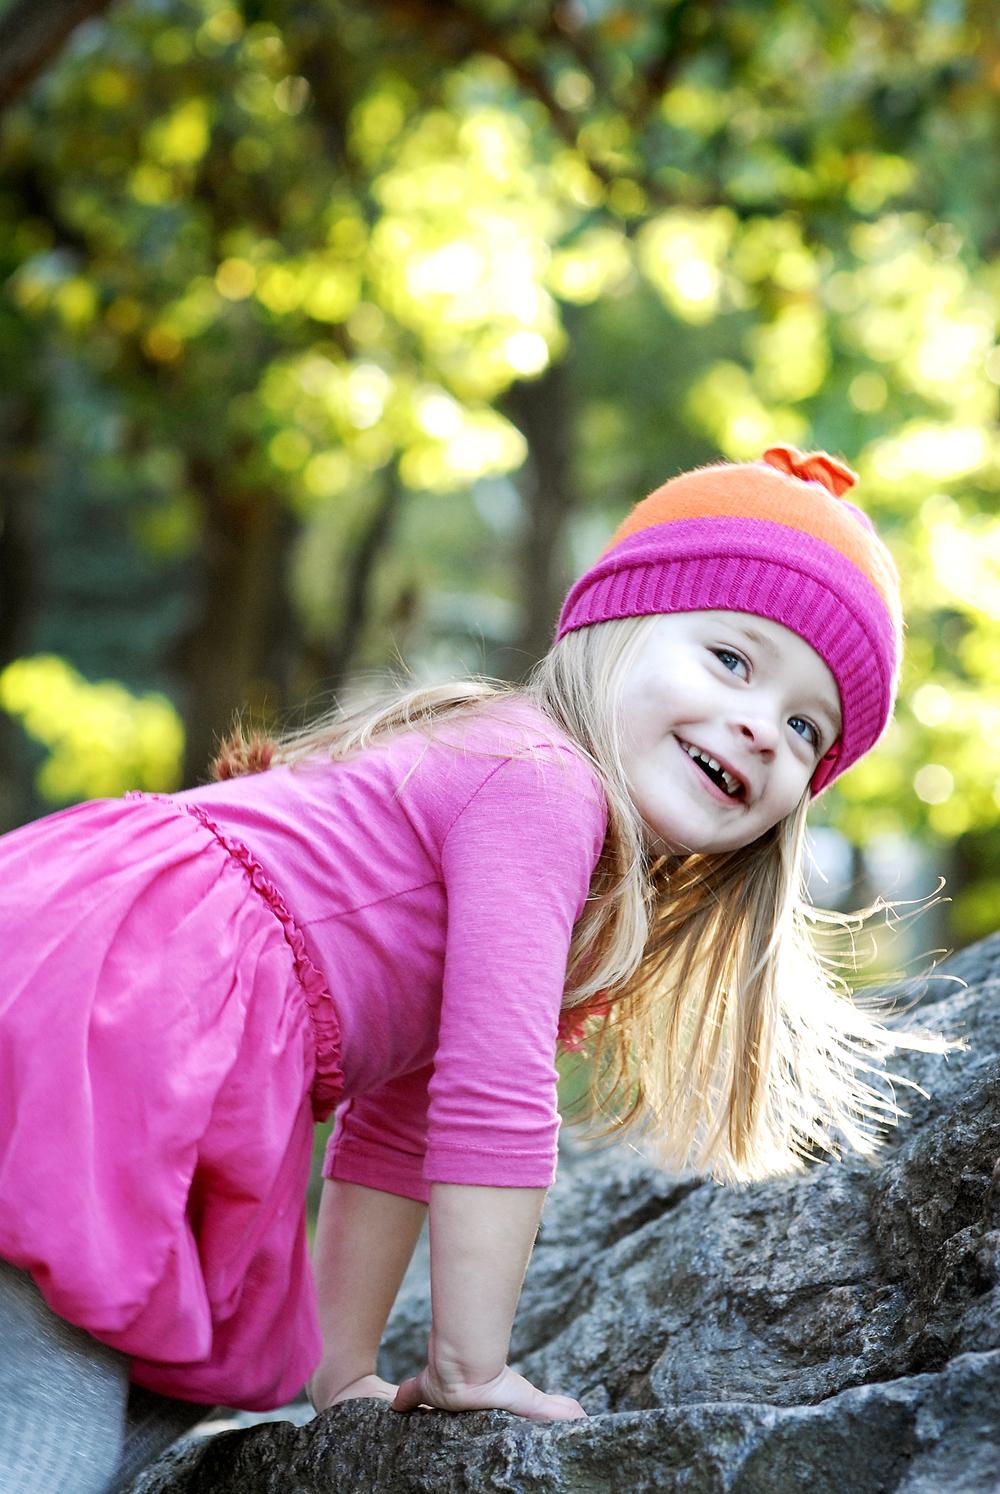 _DSC0545 cameron with hat looking up smiling color sensation.jpg